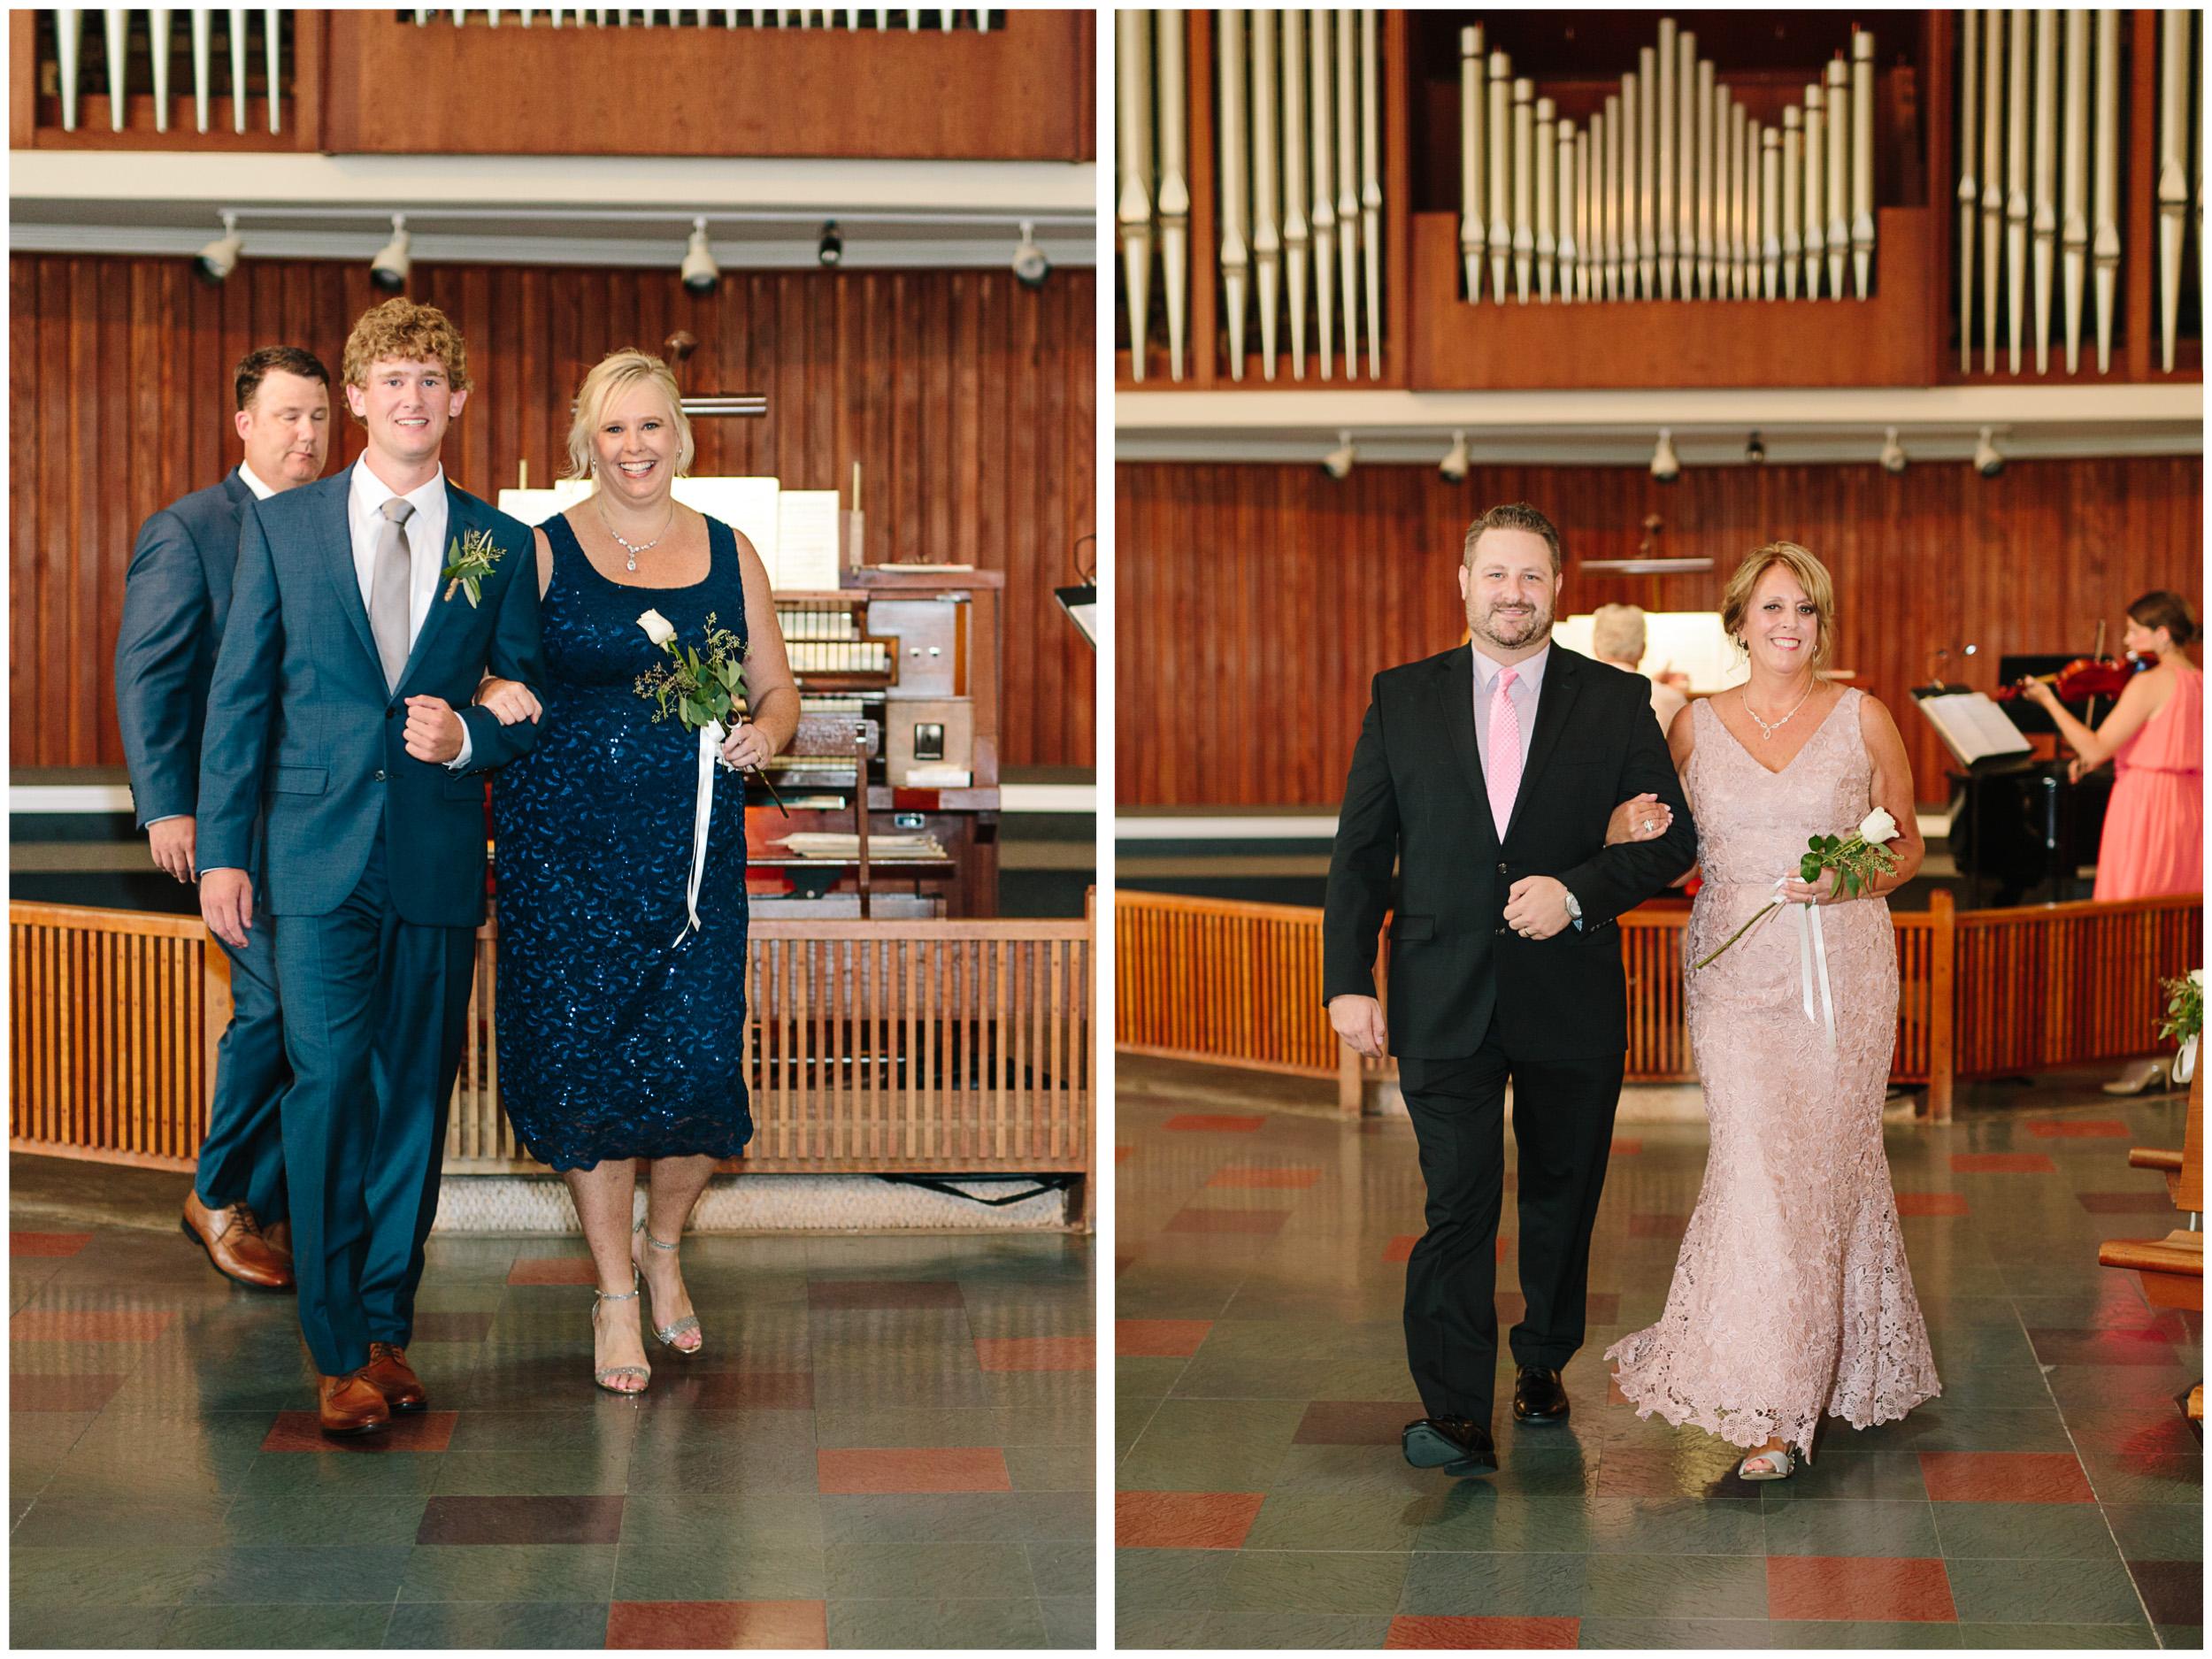 ann_arbor_michigan_wedding_60.jpg